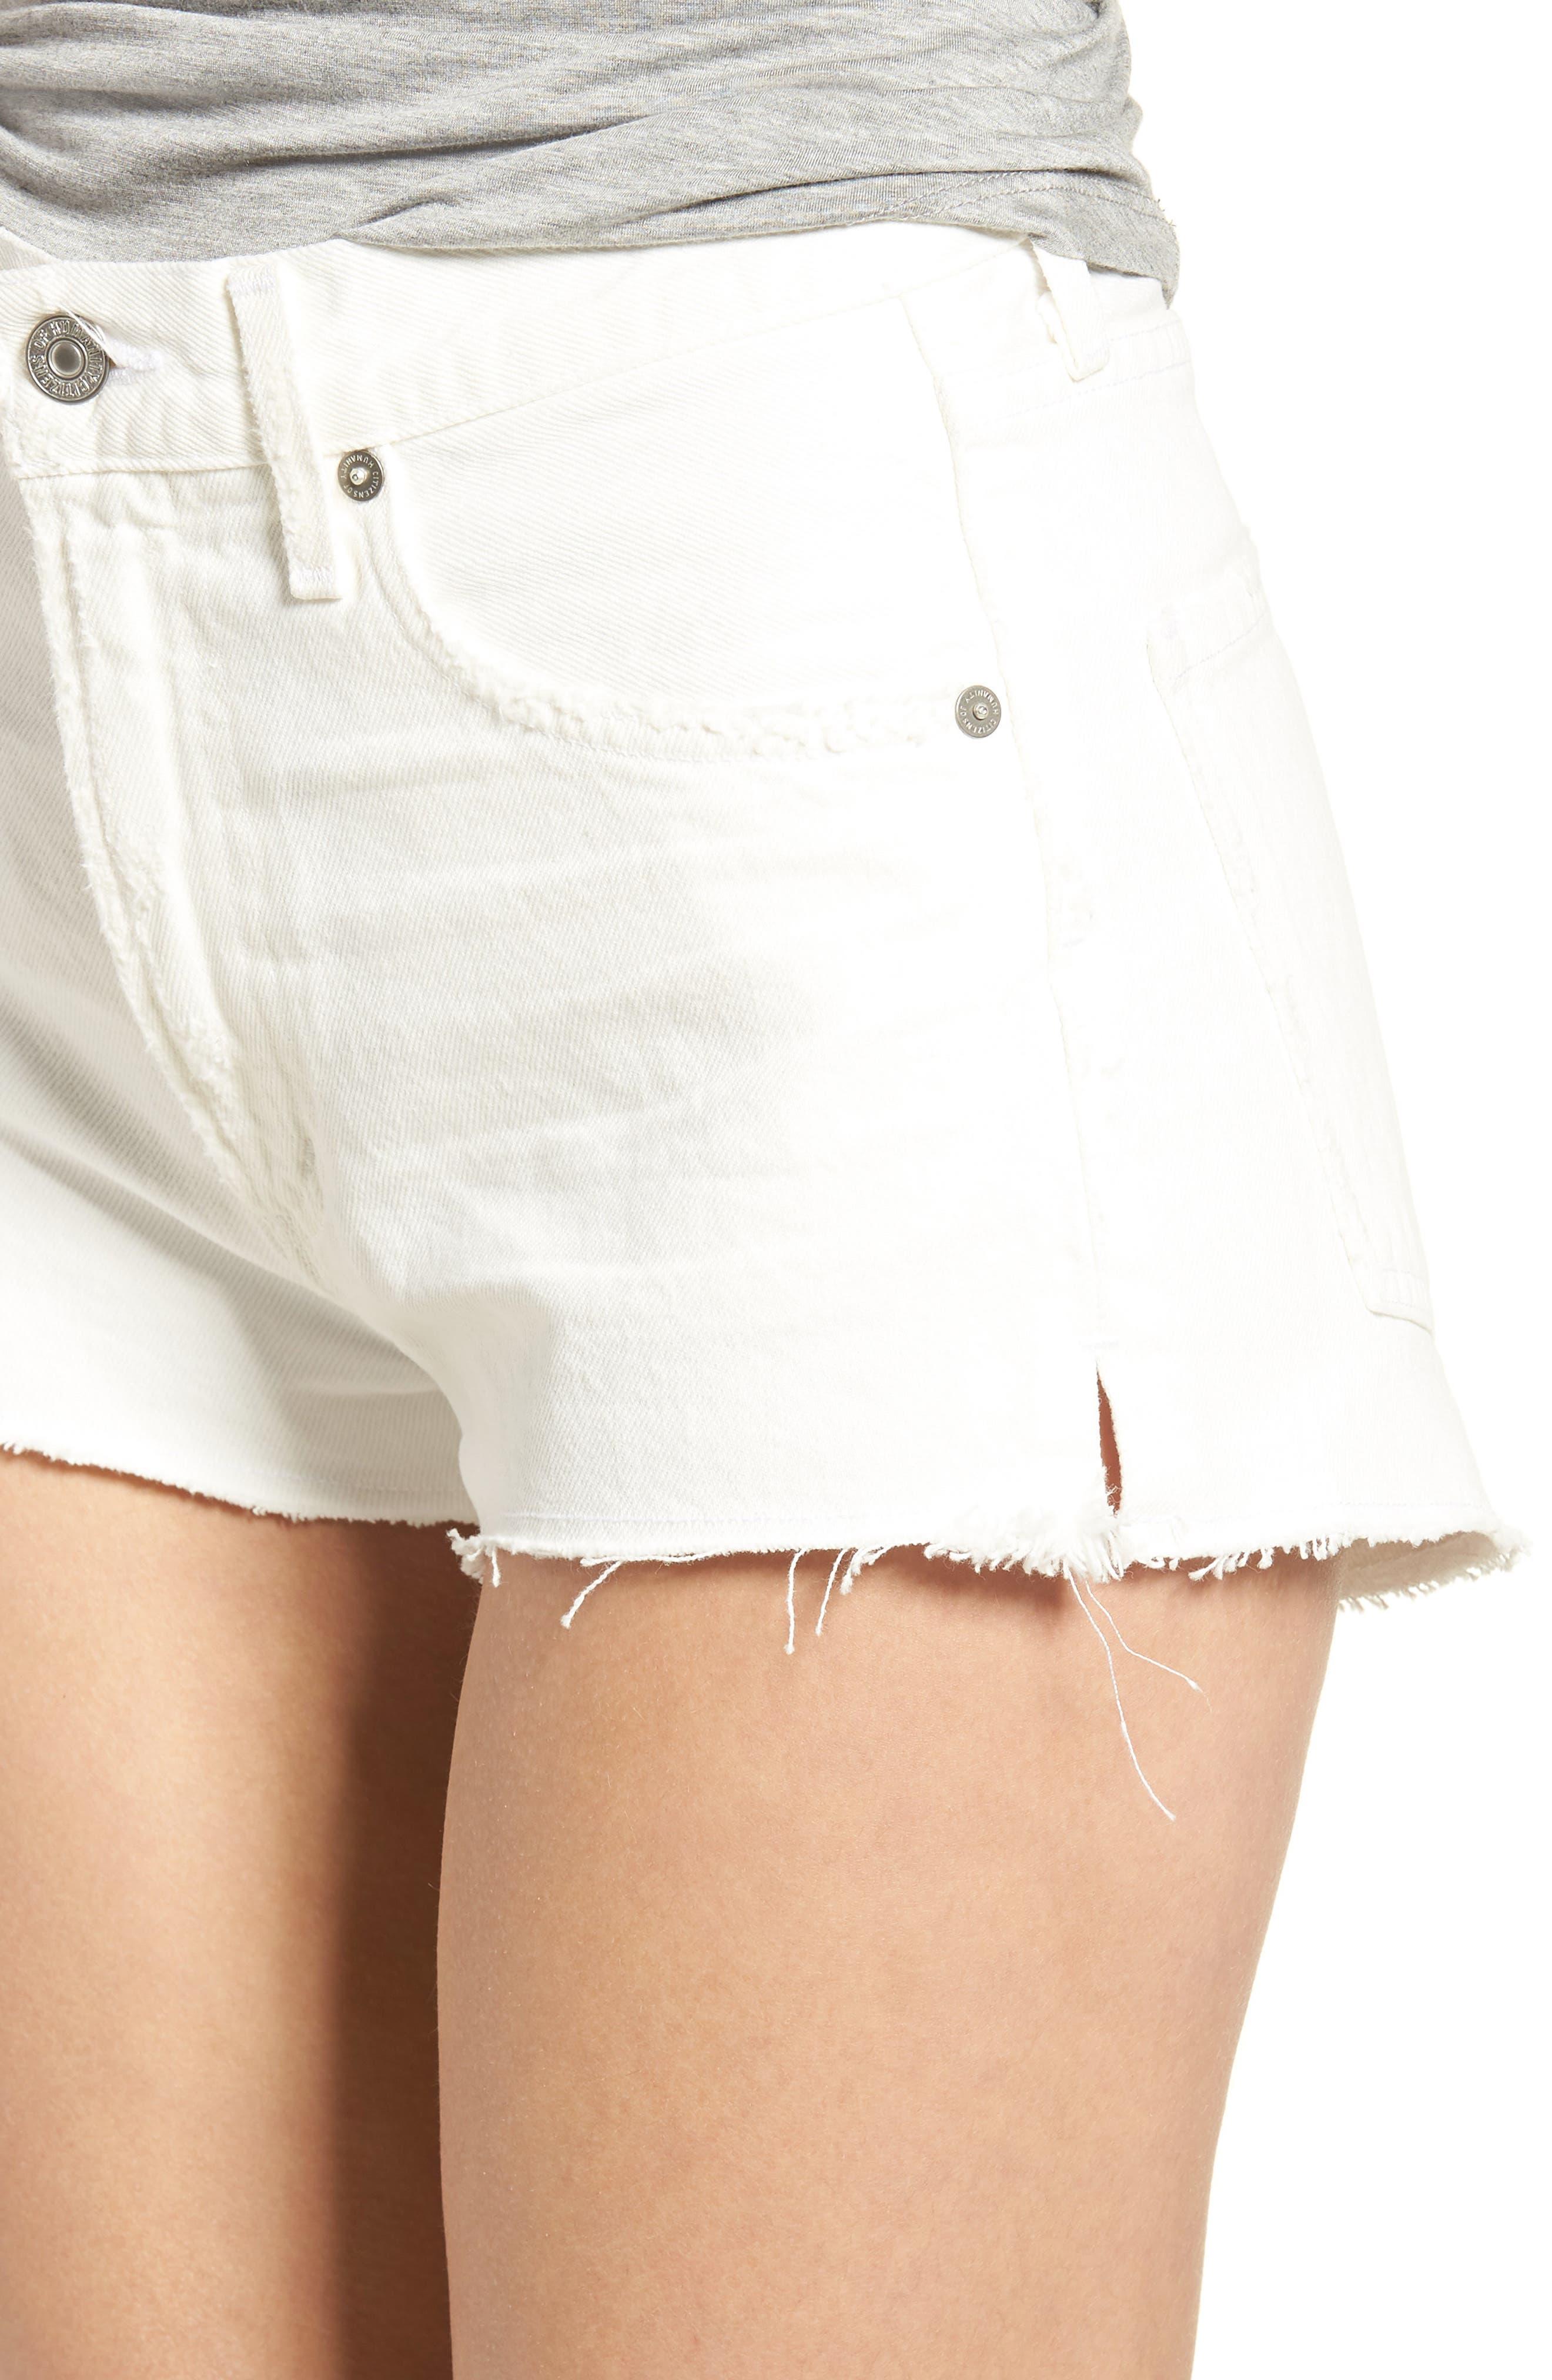 Danielle Cutoff Denim Shorts,                             Alternate thumbnail 4, color,